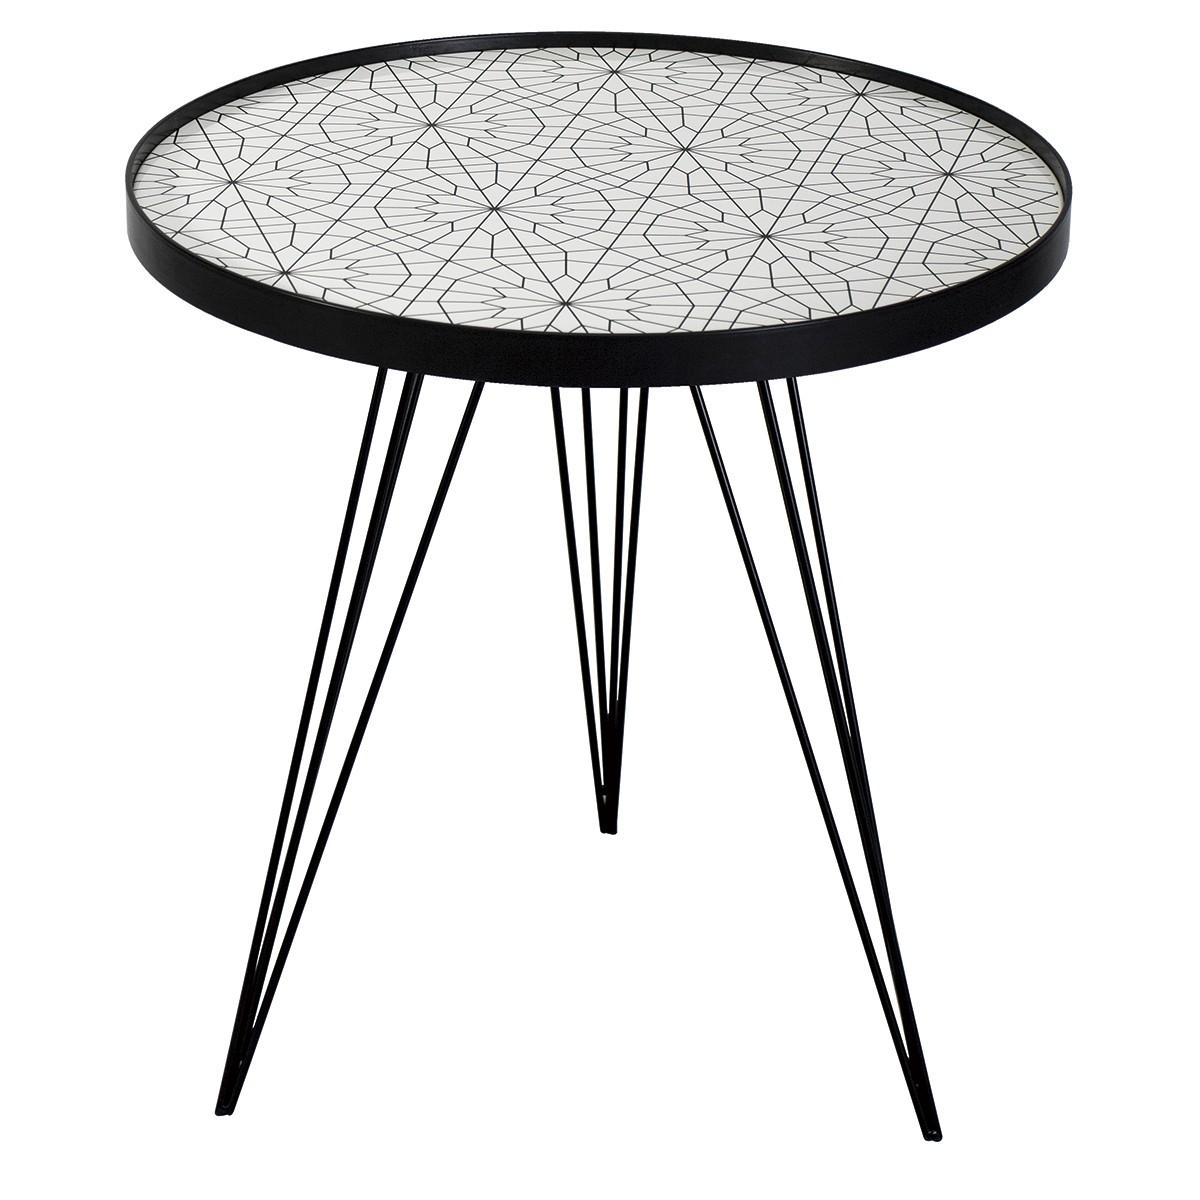 1200x1200 Sibford Round Side Table Black Amp White Print Top